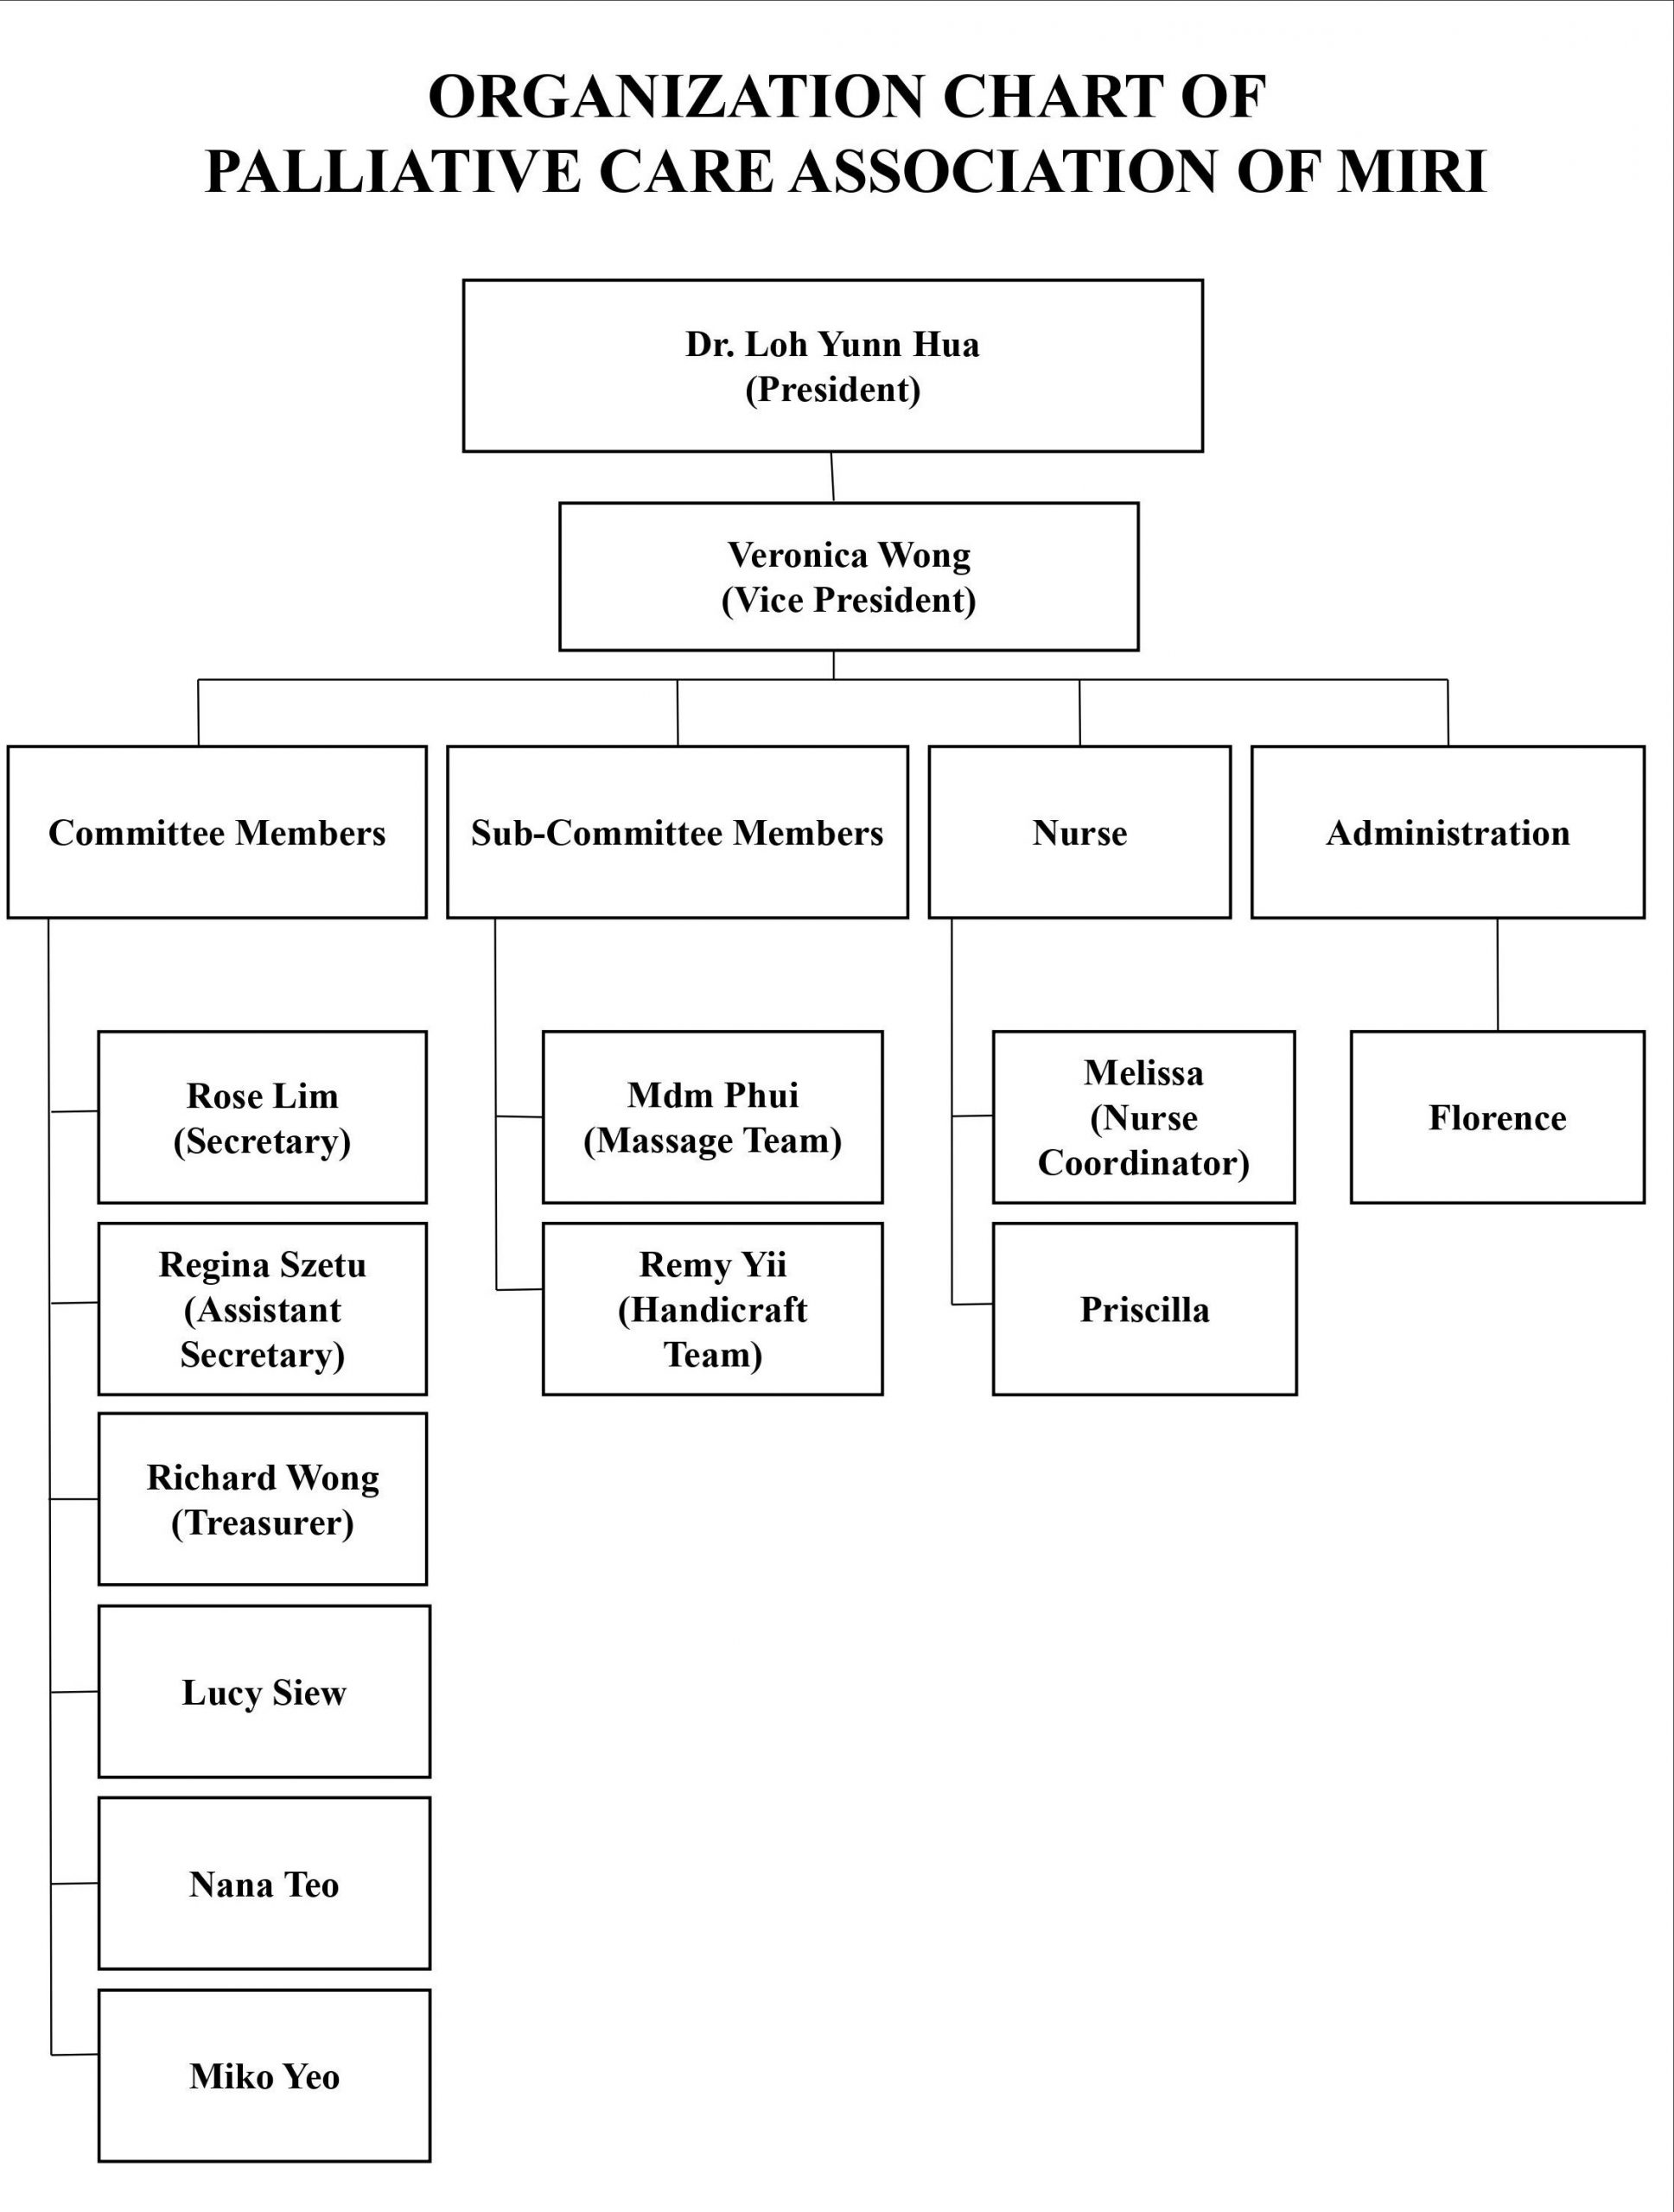 Organization Chart PCAM